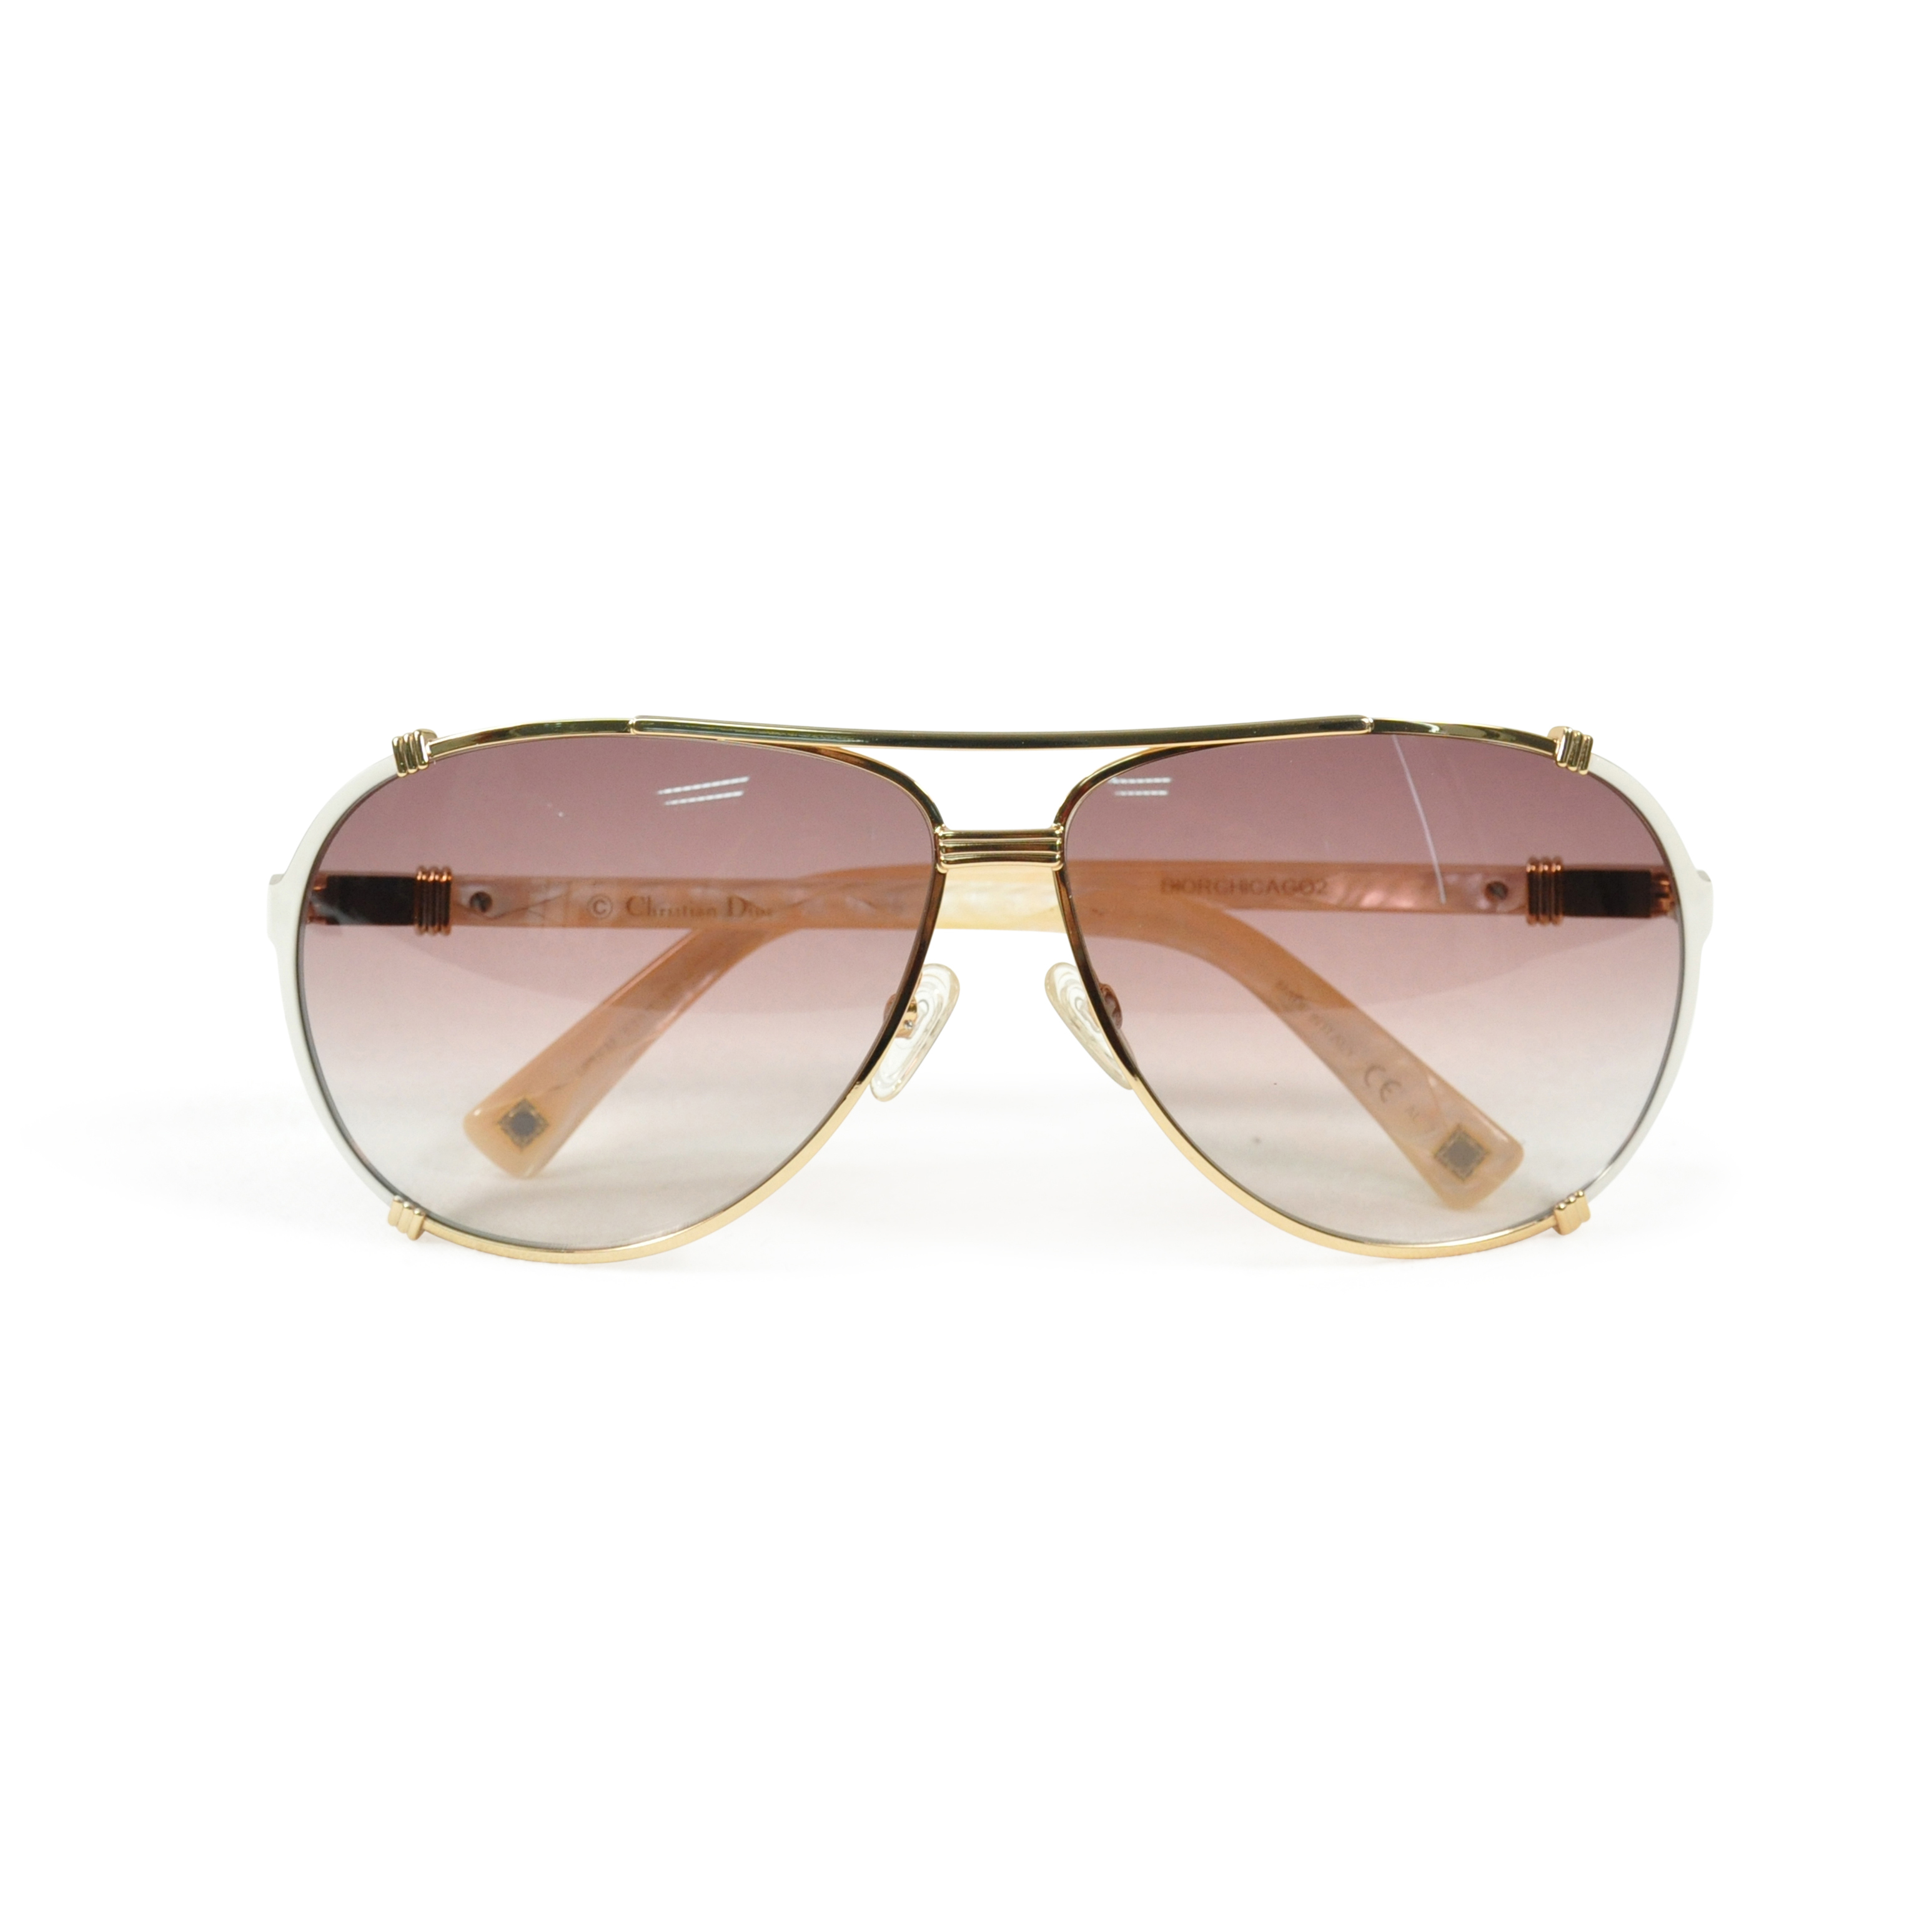 43dfbcd9c4c Dior Chicago 2 Aviator Sunglasses « One More Soul